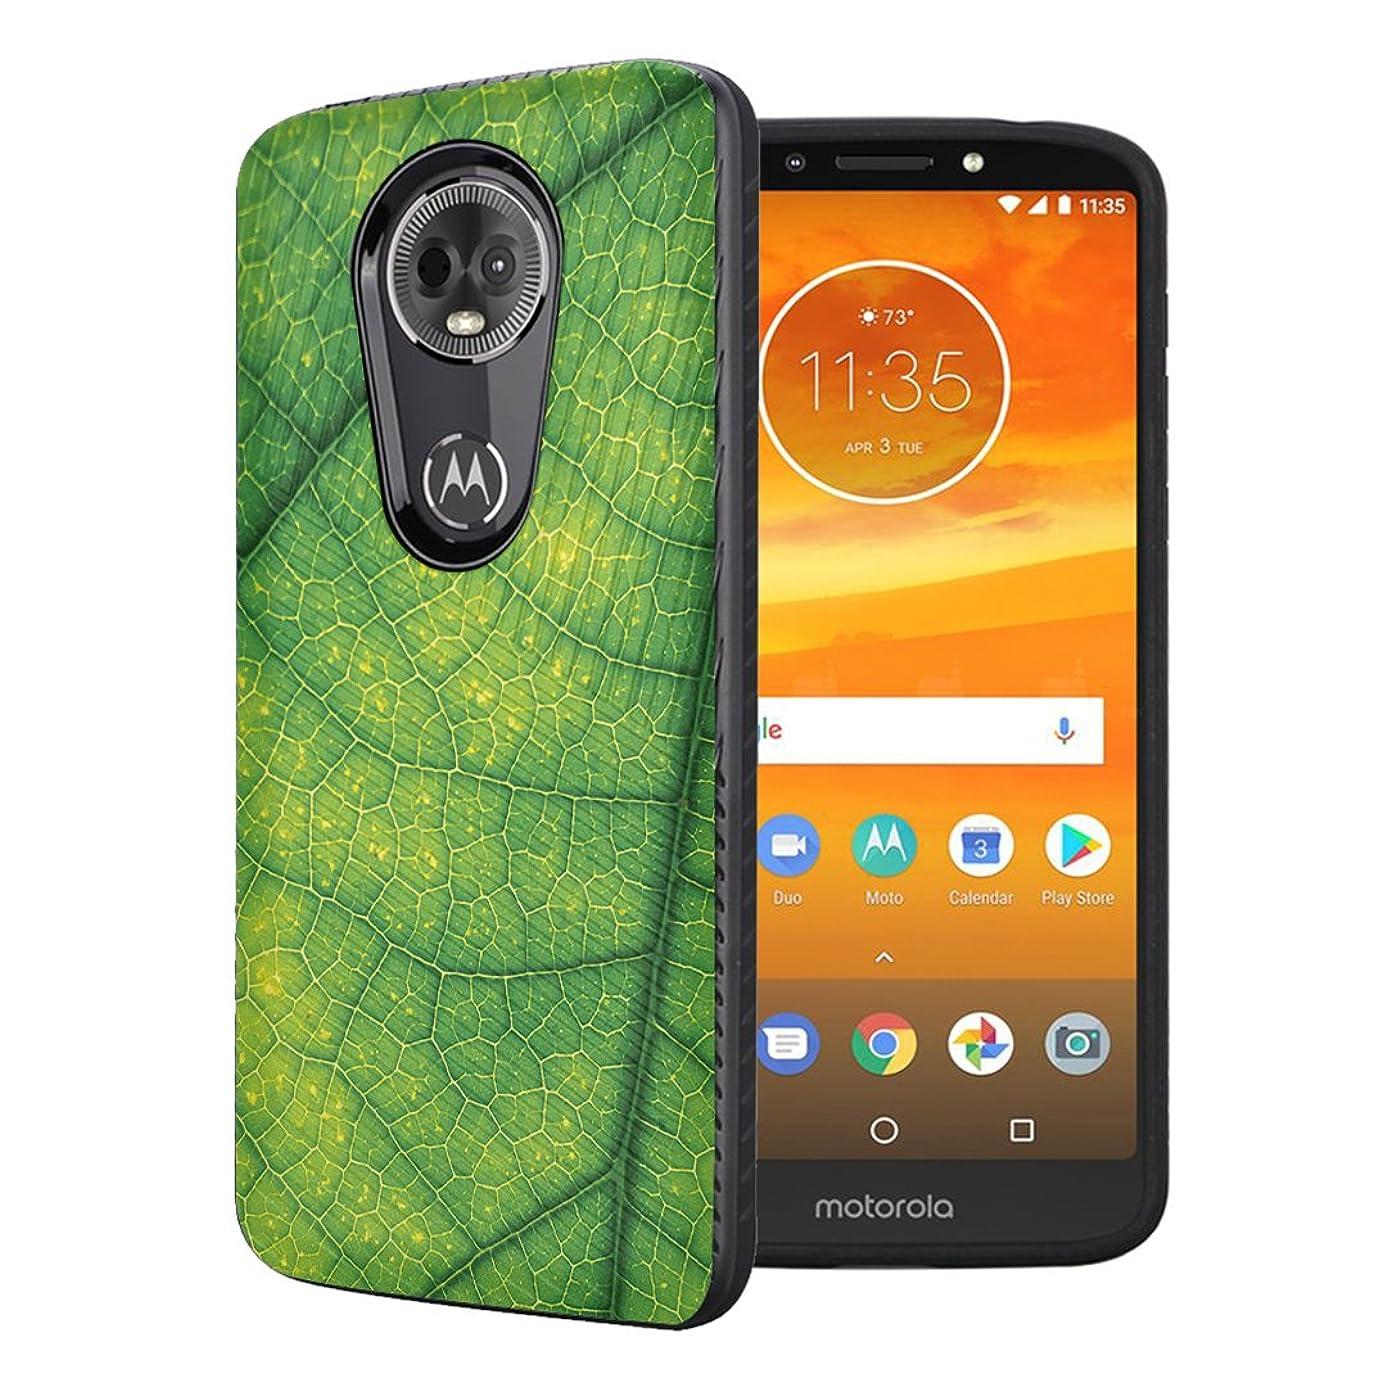 Moriko Case Compatible with Moto G7 Power, Moto G7 Supra [Embossed Diagonal Lines Hybrid Slim Armor Black Case] for Motorola Moto G7 Power - (Green Leaf Veins)